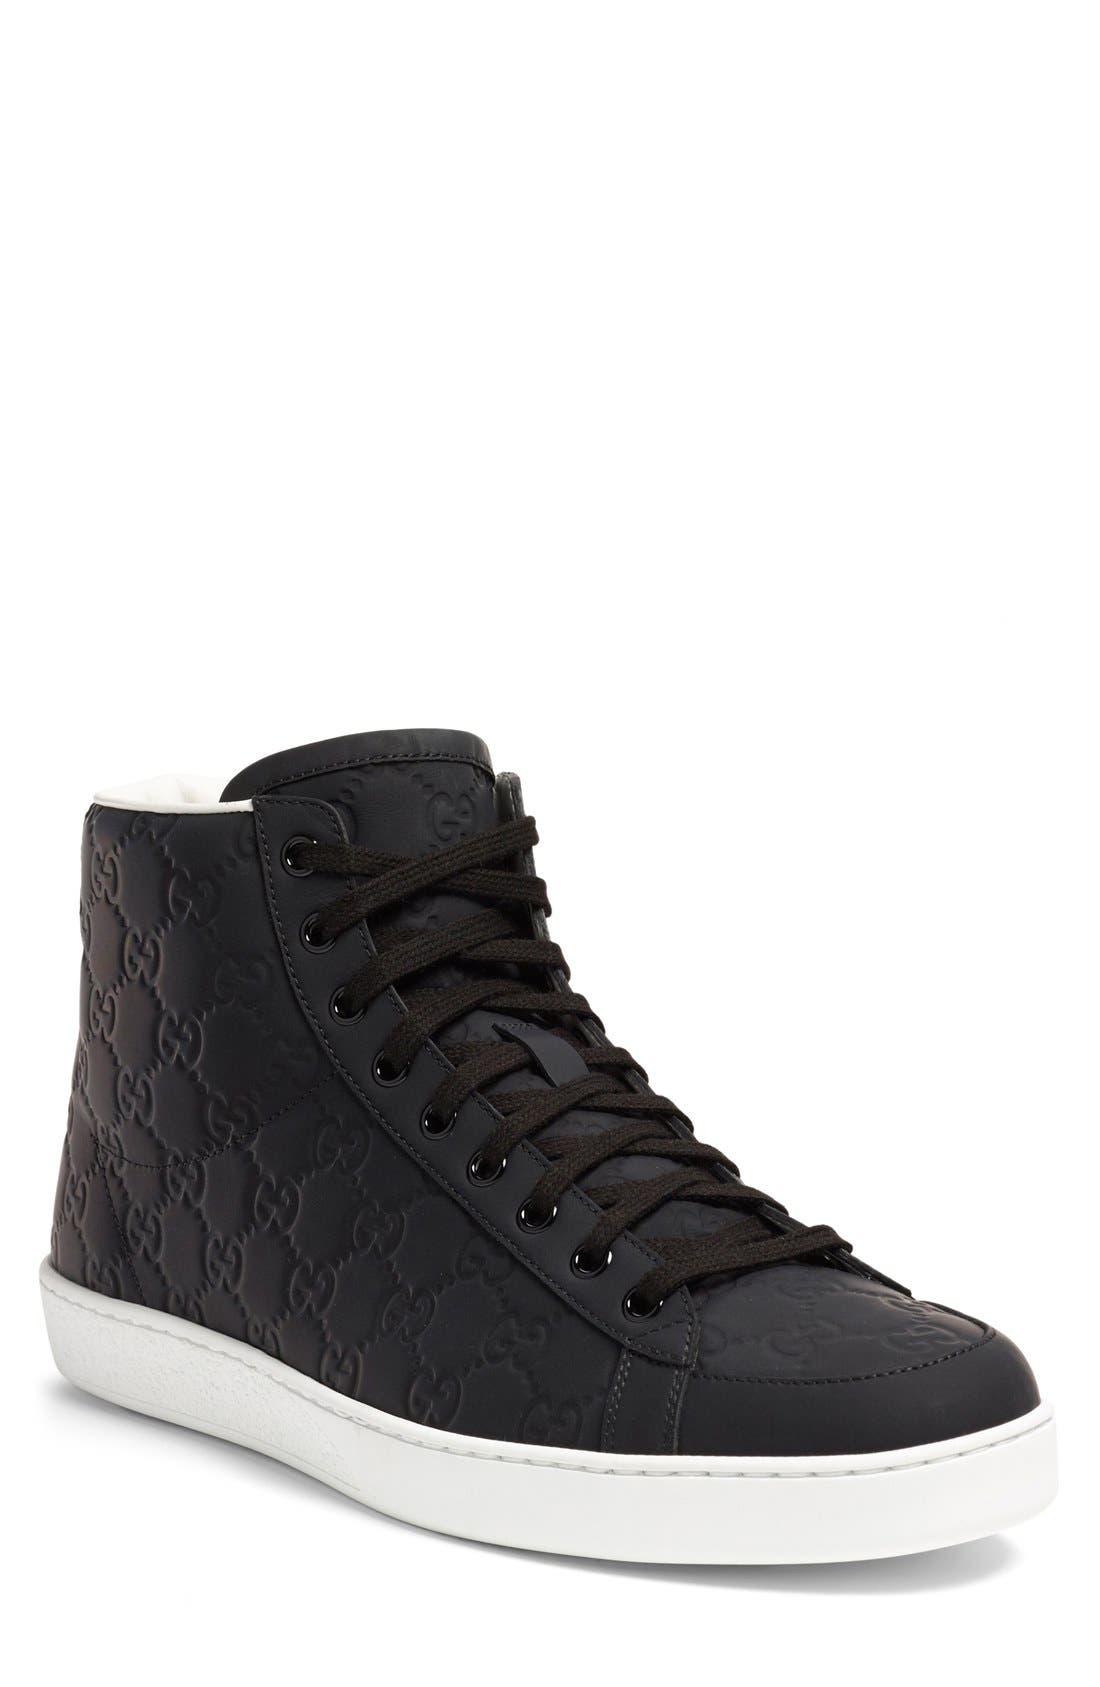 'Brooklyn' High-Top Sneaker, Main, color, 001